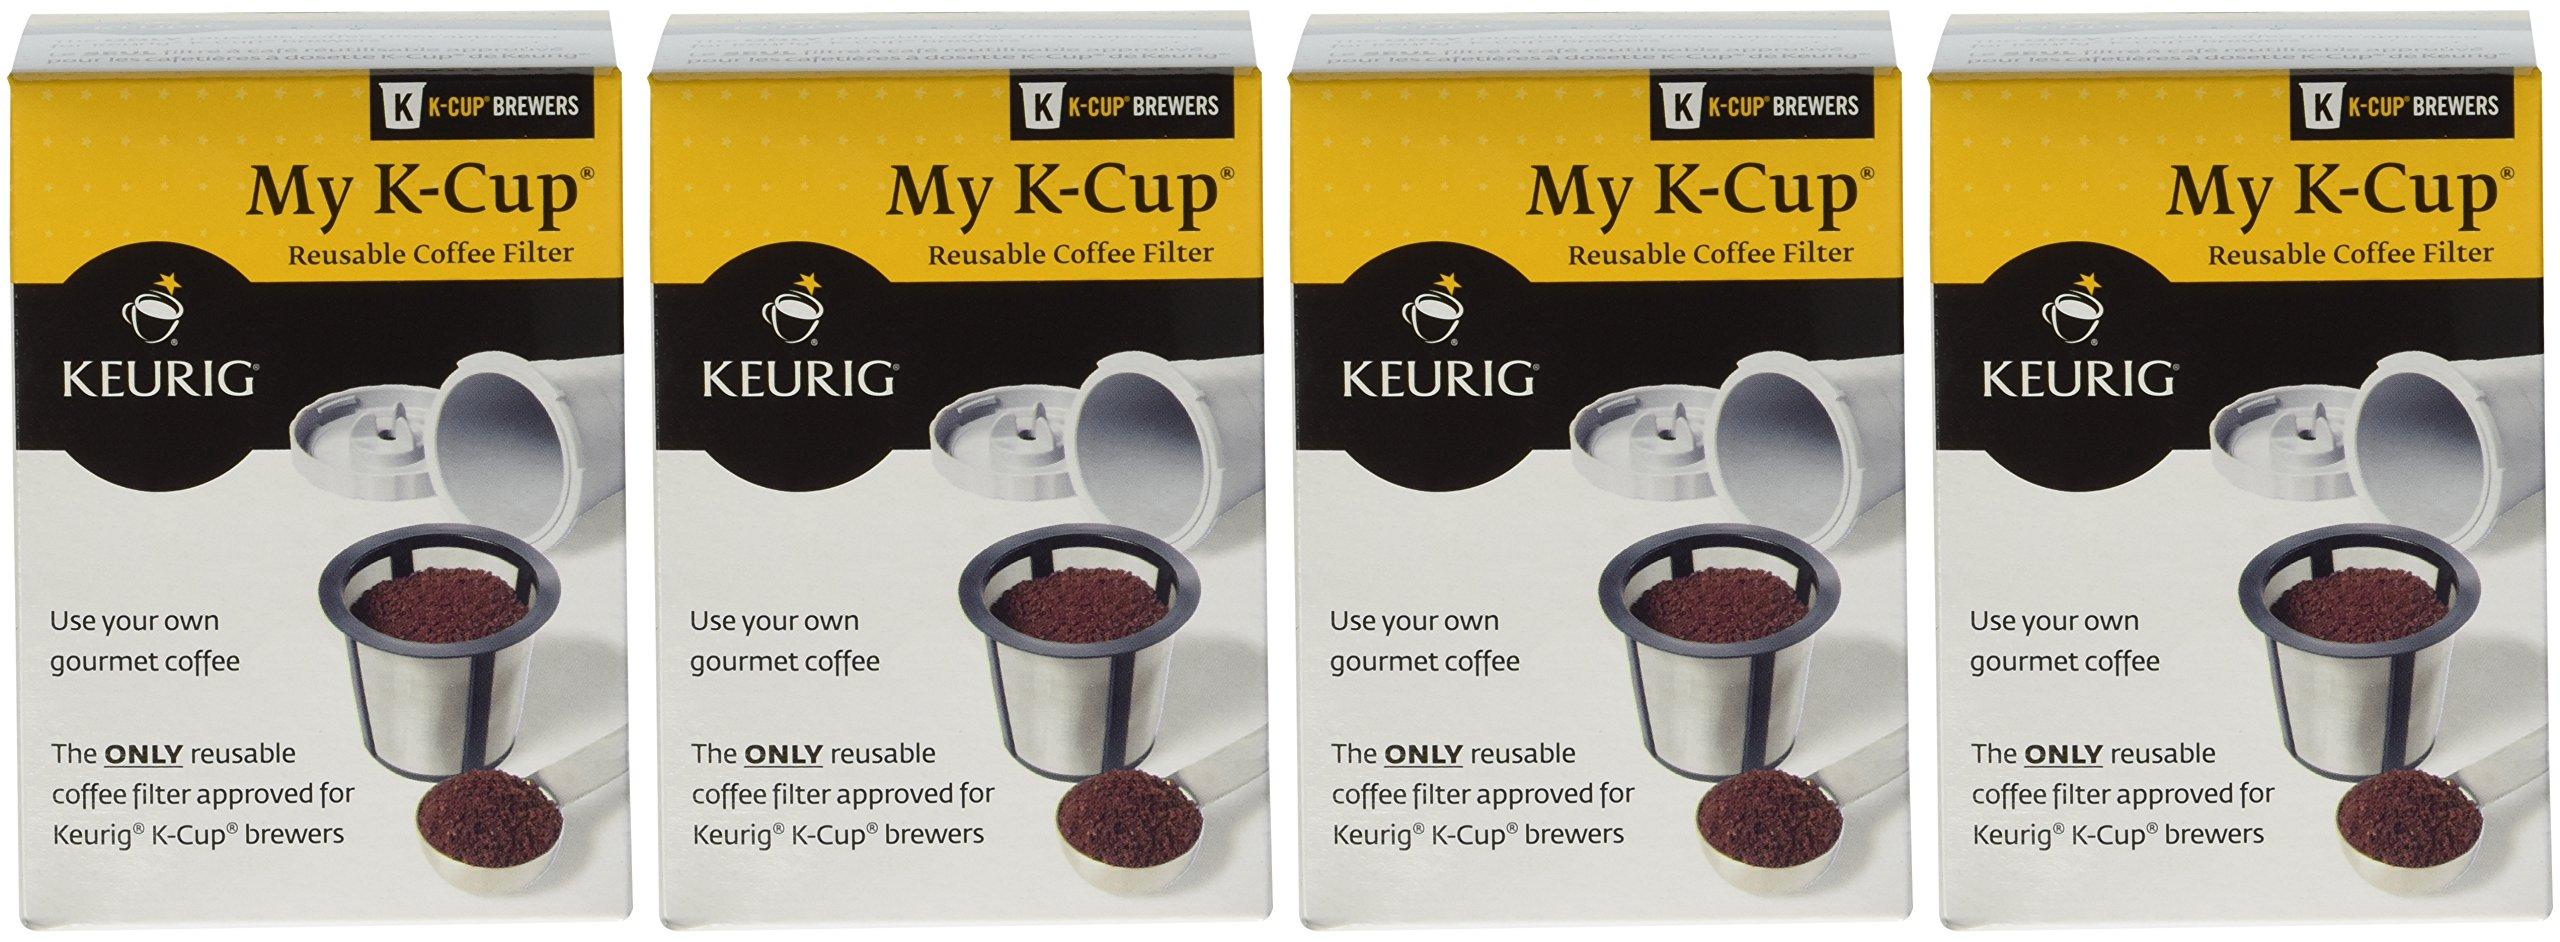 Keurig My K-Cup Reusable Coffee Filter (Gray, 4)